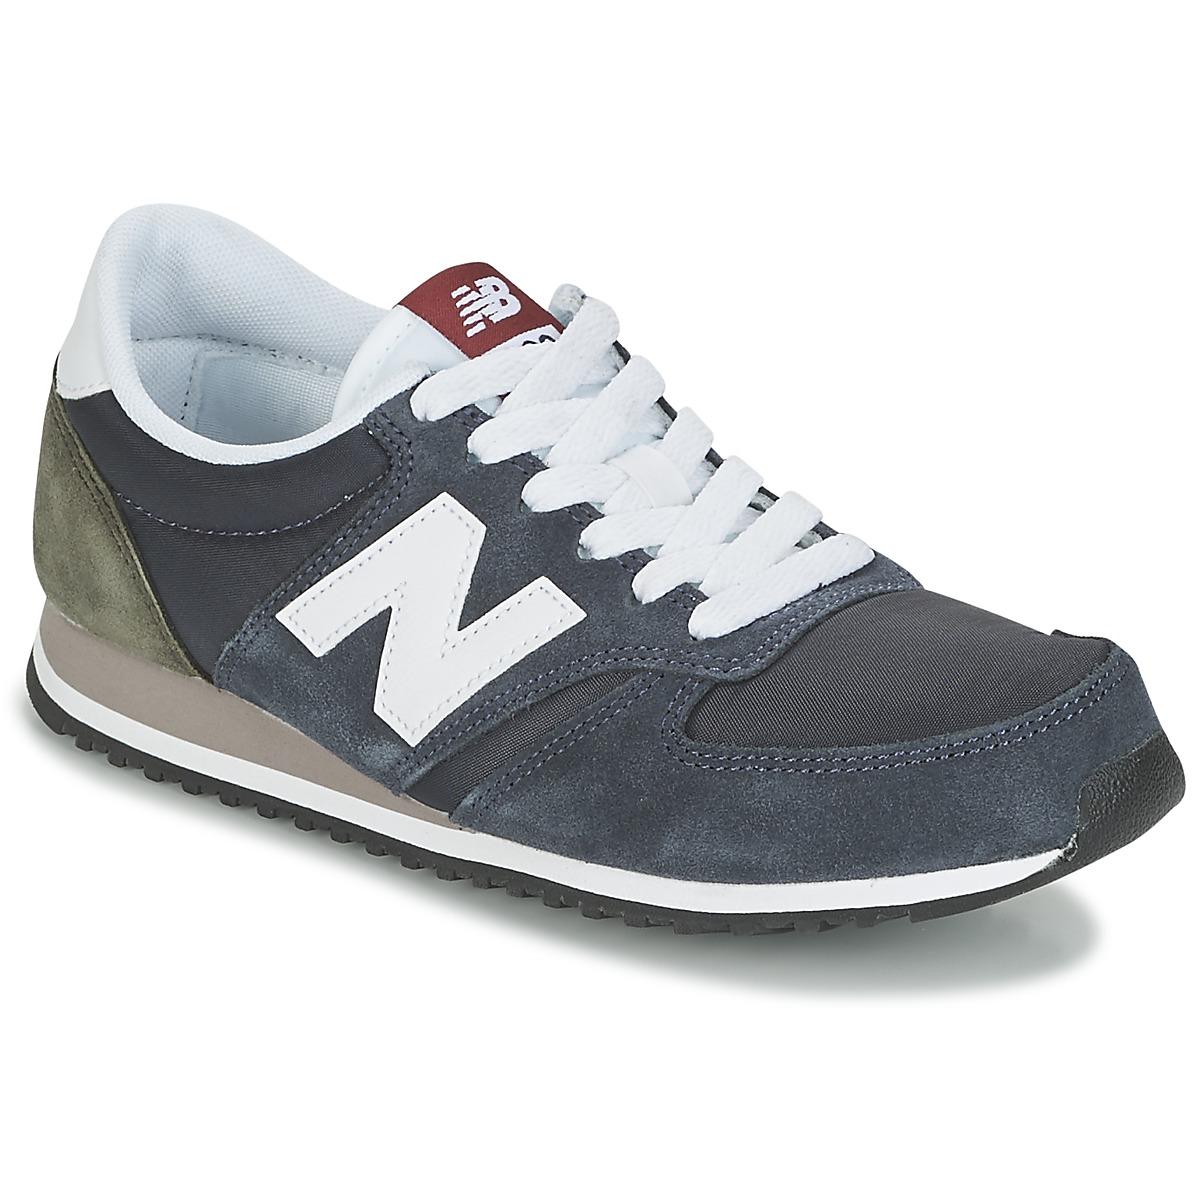 zapatillas new balance 996